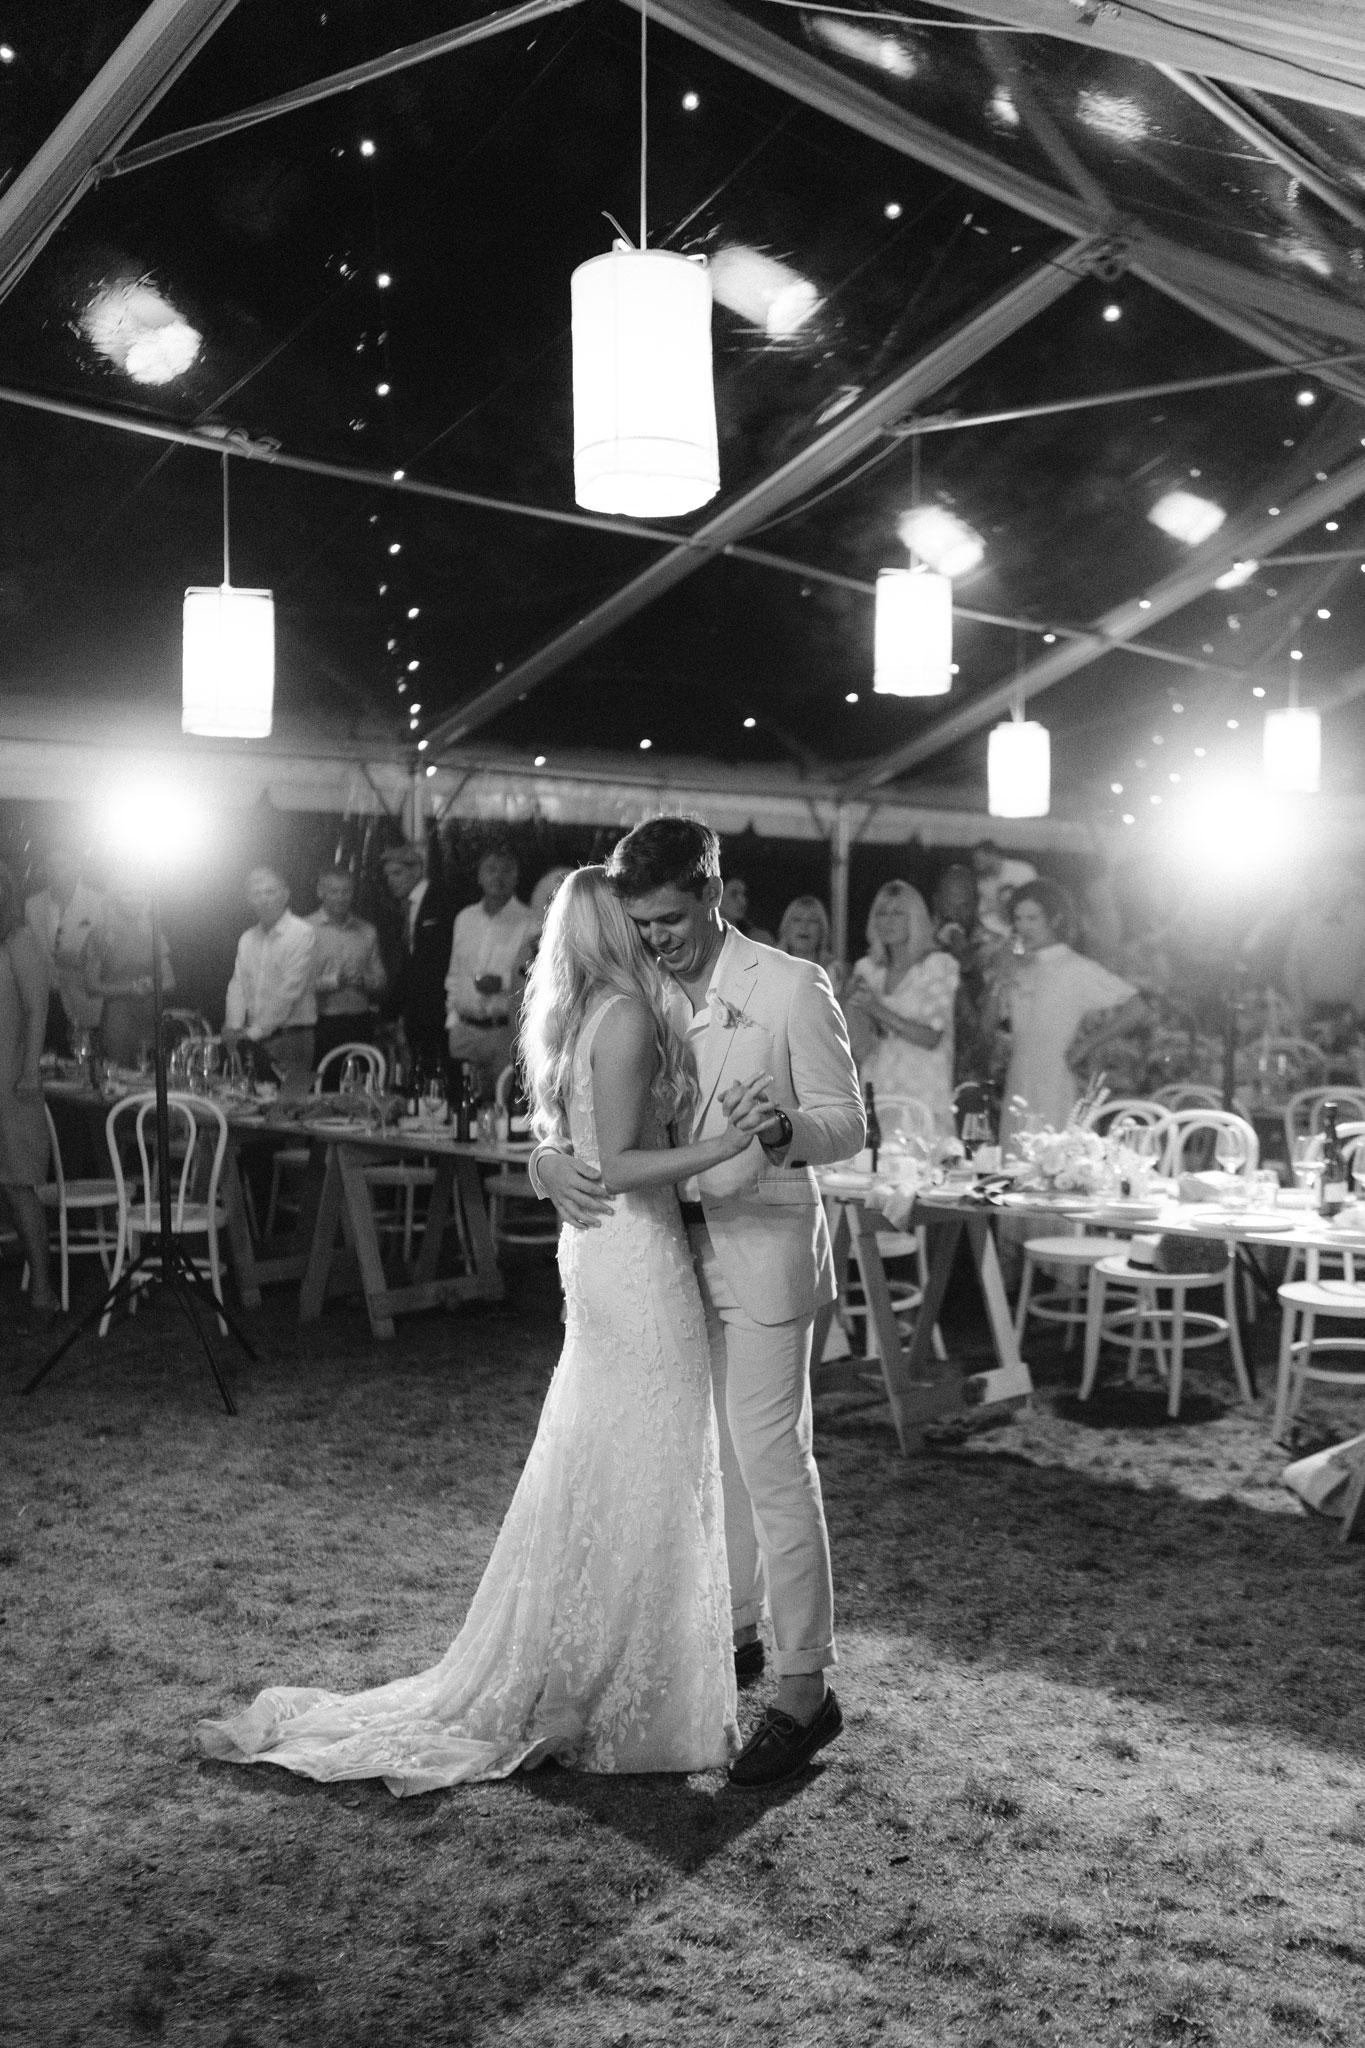 newfound-k-b-coromandel-wedding-photographers-140